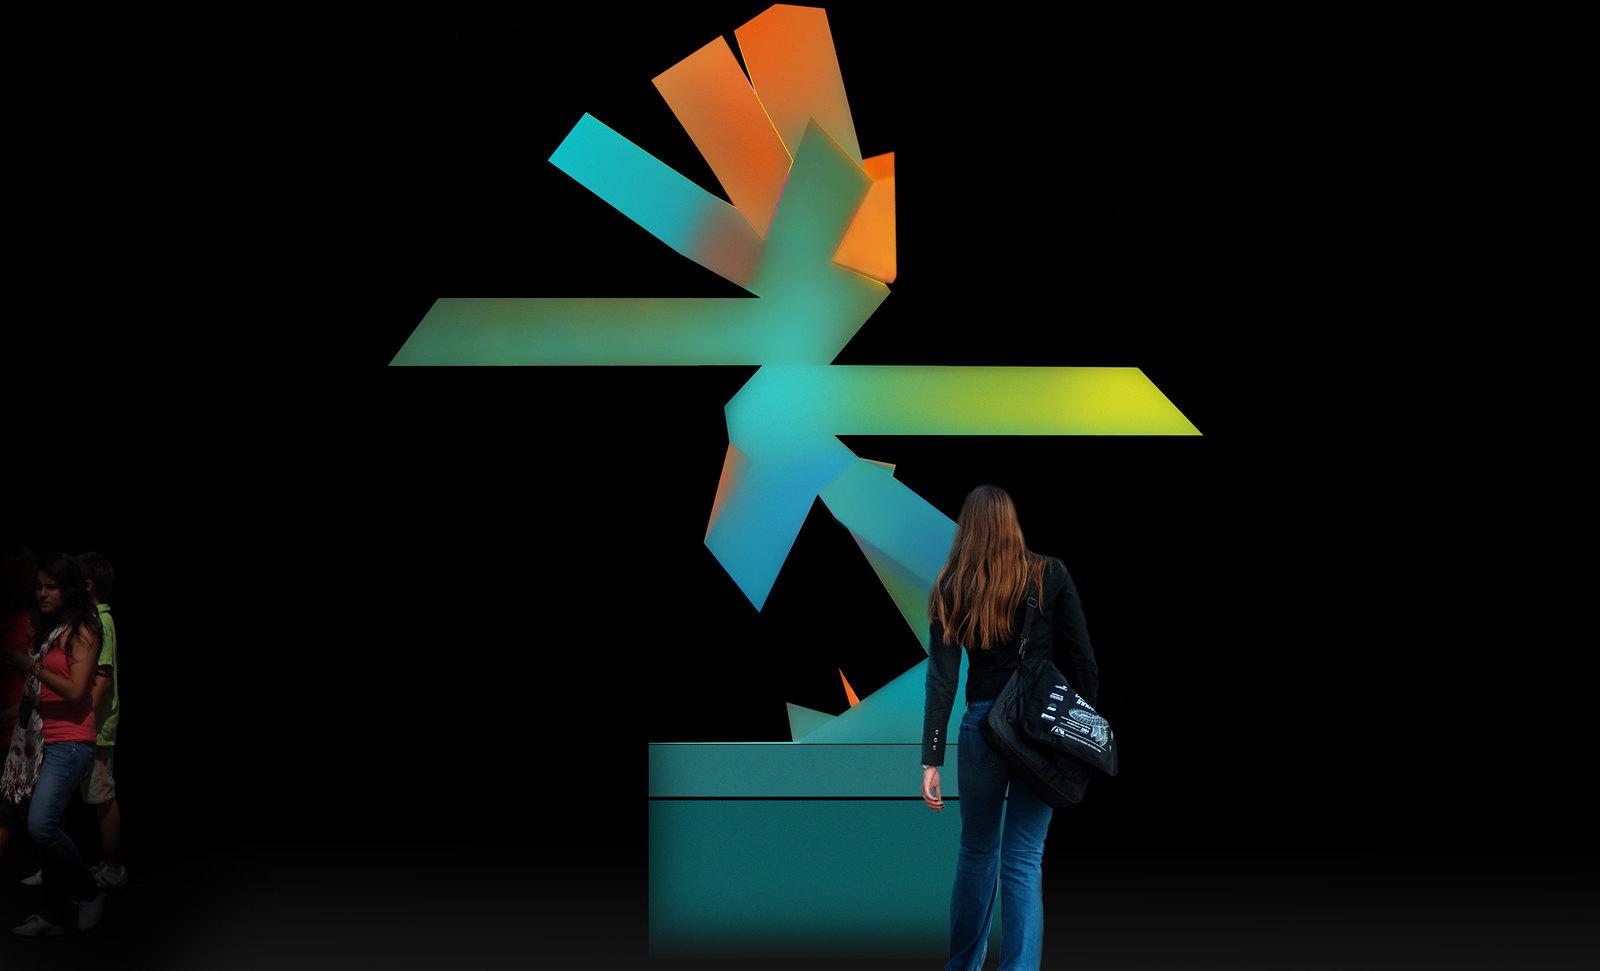 Escultura MAM mx 027